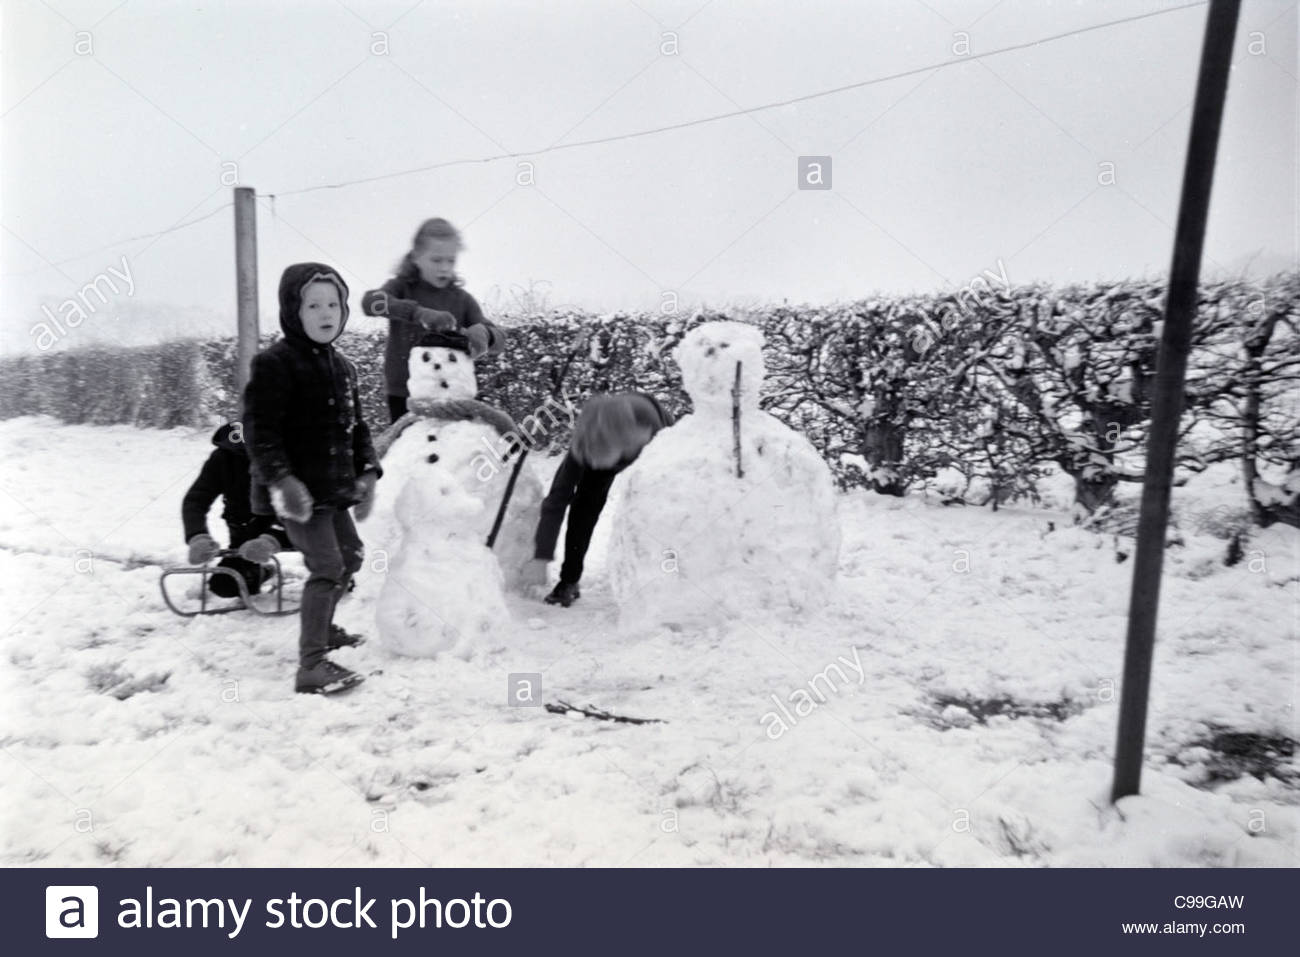 children making snowman 1960s - Stock Image